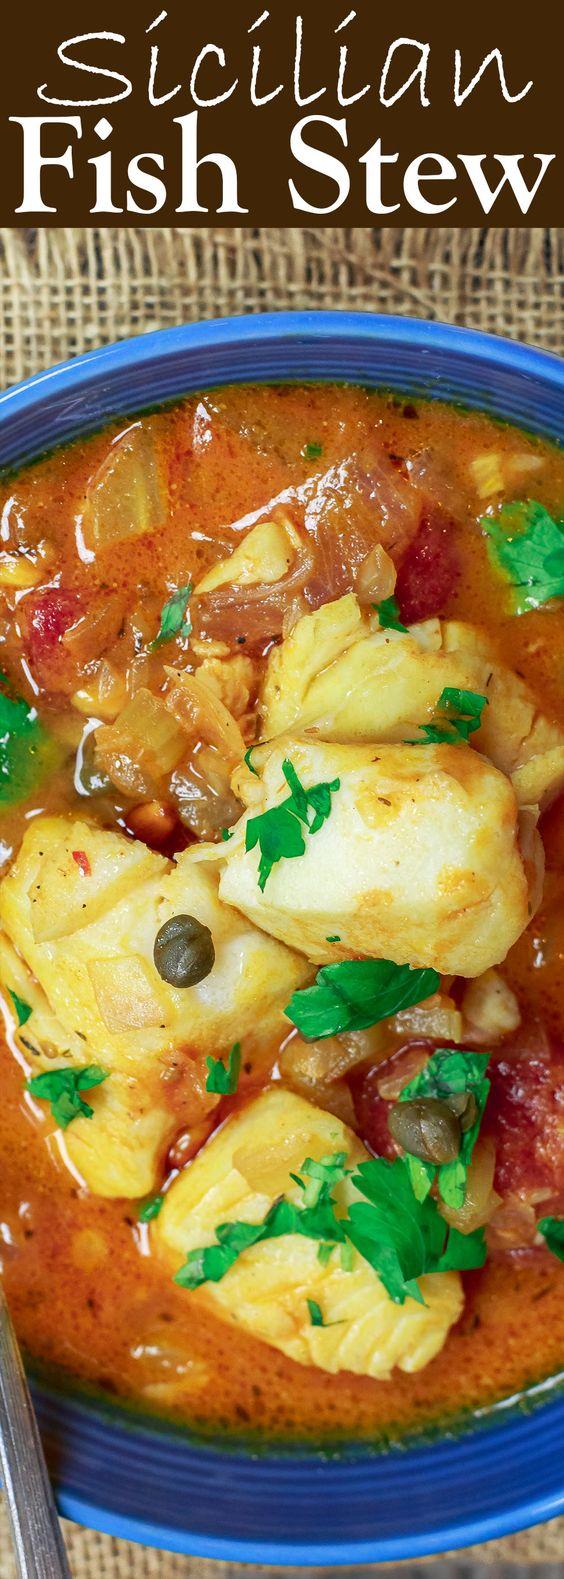 SICILIAN-STYLE FISH STEW RECIPE  #Food #Vegetarian #vegetarianrecipes #vegetarianrecipeshealthy #vegetarian meals #vegetarianchili #vegetarianmealprep #vegetarianrecipesdinner #vegetarianrecipesdinnereasy #vegetarianrecipeshighprotein #easyrecipes #recipes #CookbookRecipesEasy #HealtyRecipes #fishrecipes  #moquecabrazilian #fish stew #foodRecipes #foodburgers #fooddrinkrecipeS #Cooker #masonjar #healthy #recipes #greatist #vegetarian #breakfast #brunch  #legumes #chicken #casseroles #tortilla #homemade #popularrcipes #poultry #delicious #pastafoodrecipes  #Easy #Spices #ChopSuey #Soup #Classic #gingerbread #ginger #cake #classic #baking #dessert #recipes #christmas #dessertrecipes #Vegetarian #Food #Fish #Dessert #Lunch #Dinner #SnackRecipes #BeefRecipes #DrinkRecipes #CookbookRecipesEasy #HealthyRecipes #AllRecipes #ChickenRecipes #CookiesRecipes #ріzzа #pizzarecipe #vеgеtаrіаn #vegetarianrecipes #vеggіеѕ #vеgеtаblеѕ #grееnріzzа #vеggіеріzzа #feta #pesto #artichokes #brоссоlіSаvе   #recipesfordinner #recipesfordinnereasy #recipeswithgroundbeef  #recipeseasy #recipesfordinnerhealth #AngeliqueRecipes #RecipeLion #Recipe  #RecipesFromTheBlog #RecipesyouMUST #RecipesfromourFavoriteBloggers #BuzzFeed #Tasty #BuzzFeed #Tasty #rice #ricerecipes #chicken #dinner #dinnerrecipes #easydinner #friedrice #veggiespeas #broccoli #cauliflower #vegies,  #vegetables  #dinnerrecipes #dinnerideas #dinner #dinnerrecipeseasy #dinnerrecipesforfamily #TheDinnerMom #DinnerthenDessert #DinnerattheZoo #QuickandEasyRecipes #DinnerattheZooRecipes #DINNERRecipes #DinnerRecipesSimpleMeals #foodrecipes #fooddinner #Healthandmanymore #FoodWine #Cakes #Lifestyle #Food #FoodandFancies #FoodBloggers entralSHARINGBoard